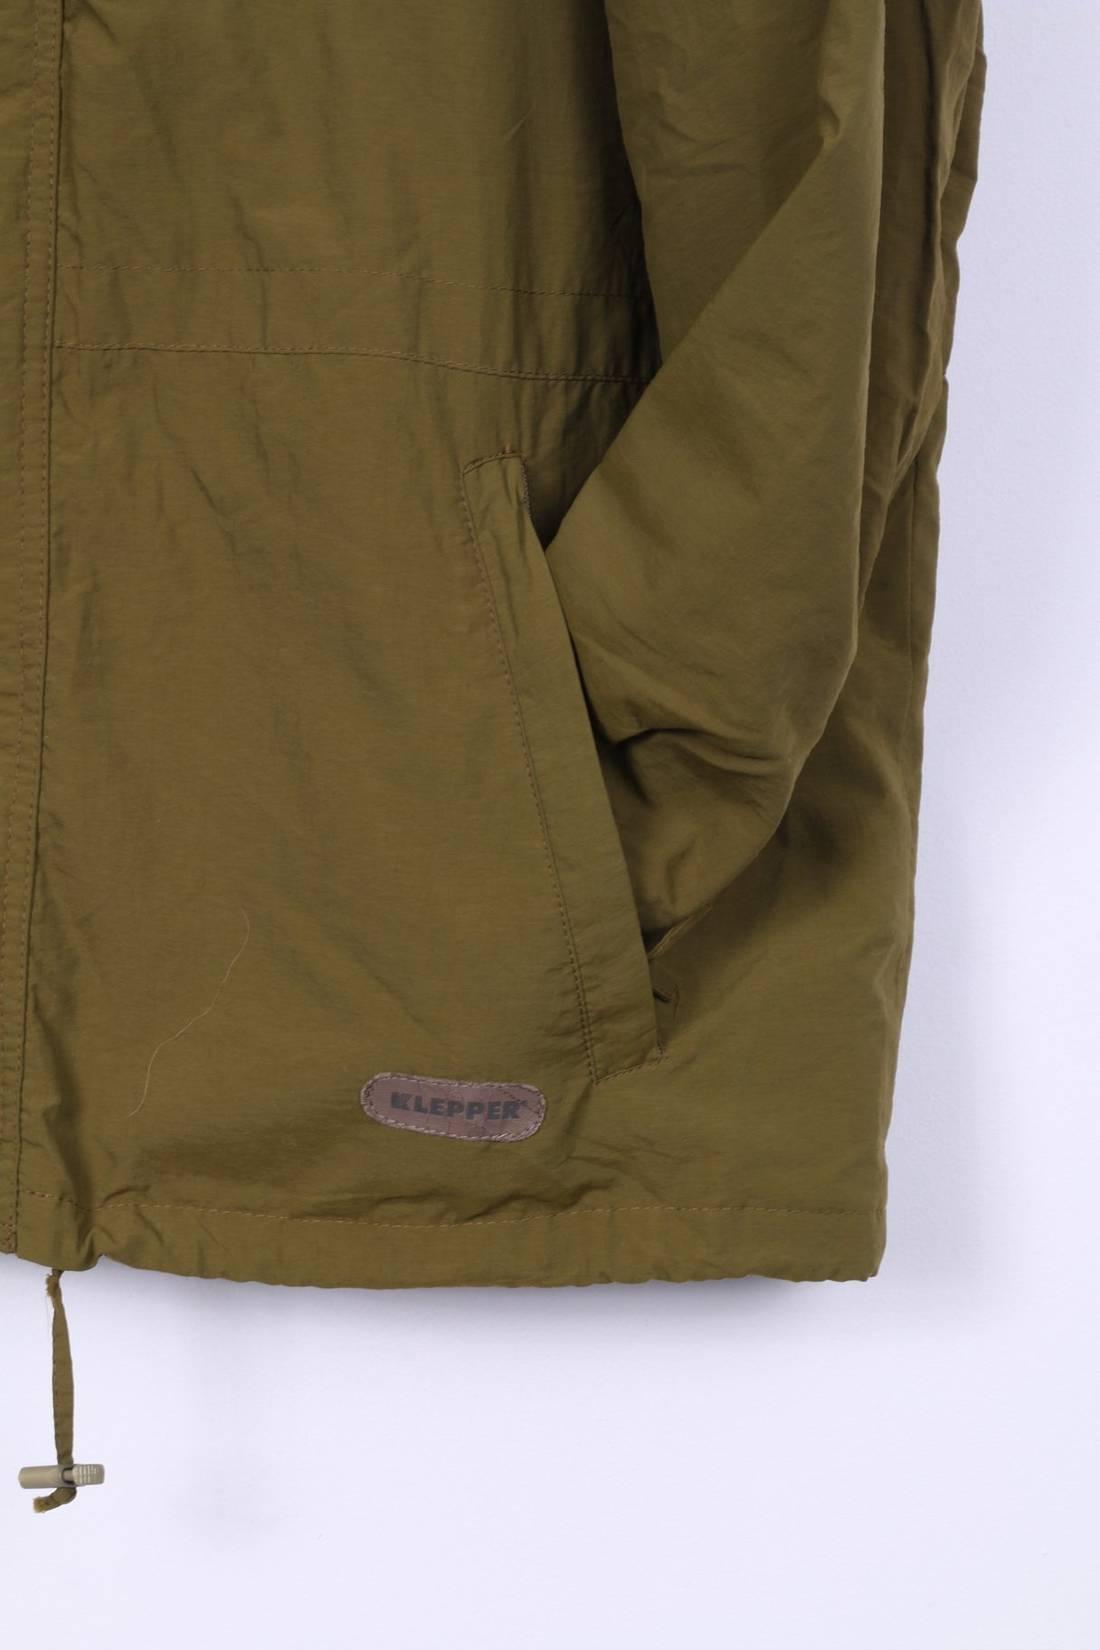 Klepper Mens 54 L/XL Harrington Jacket Green Nylon Gore-Tex Lightweight Sportswear jFqNUCDQlr